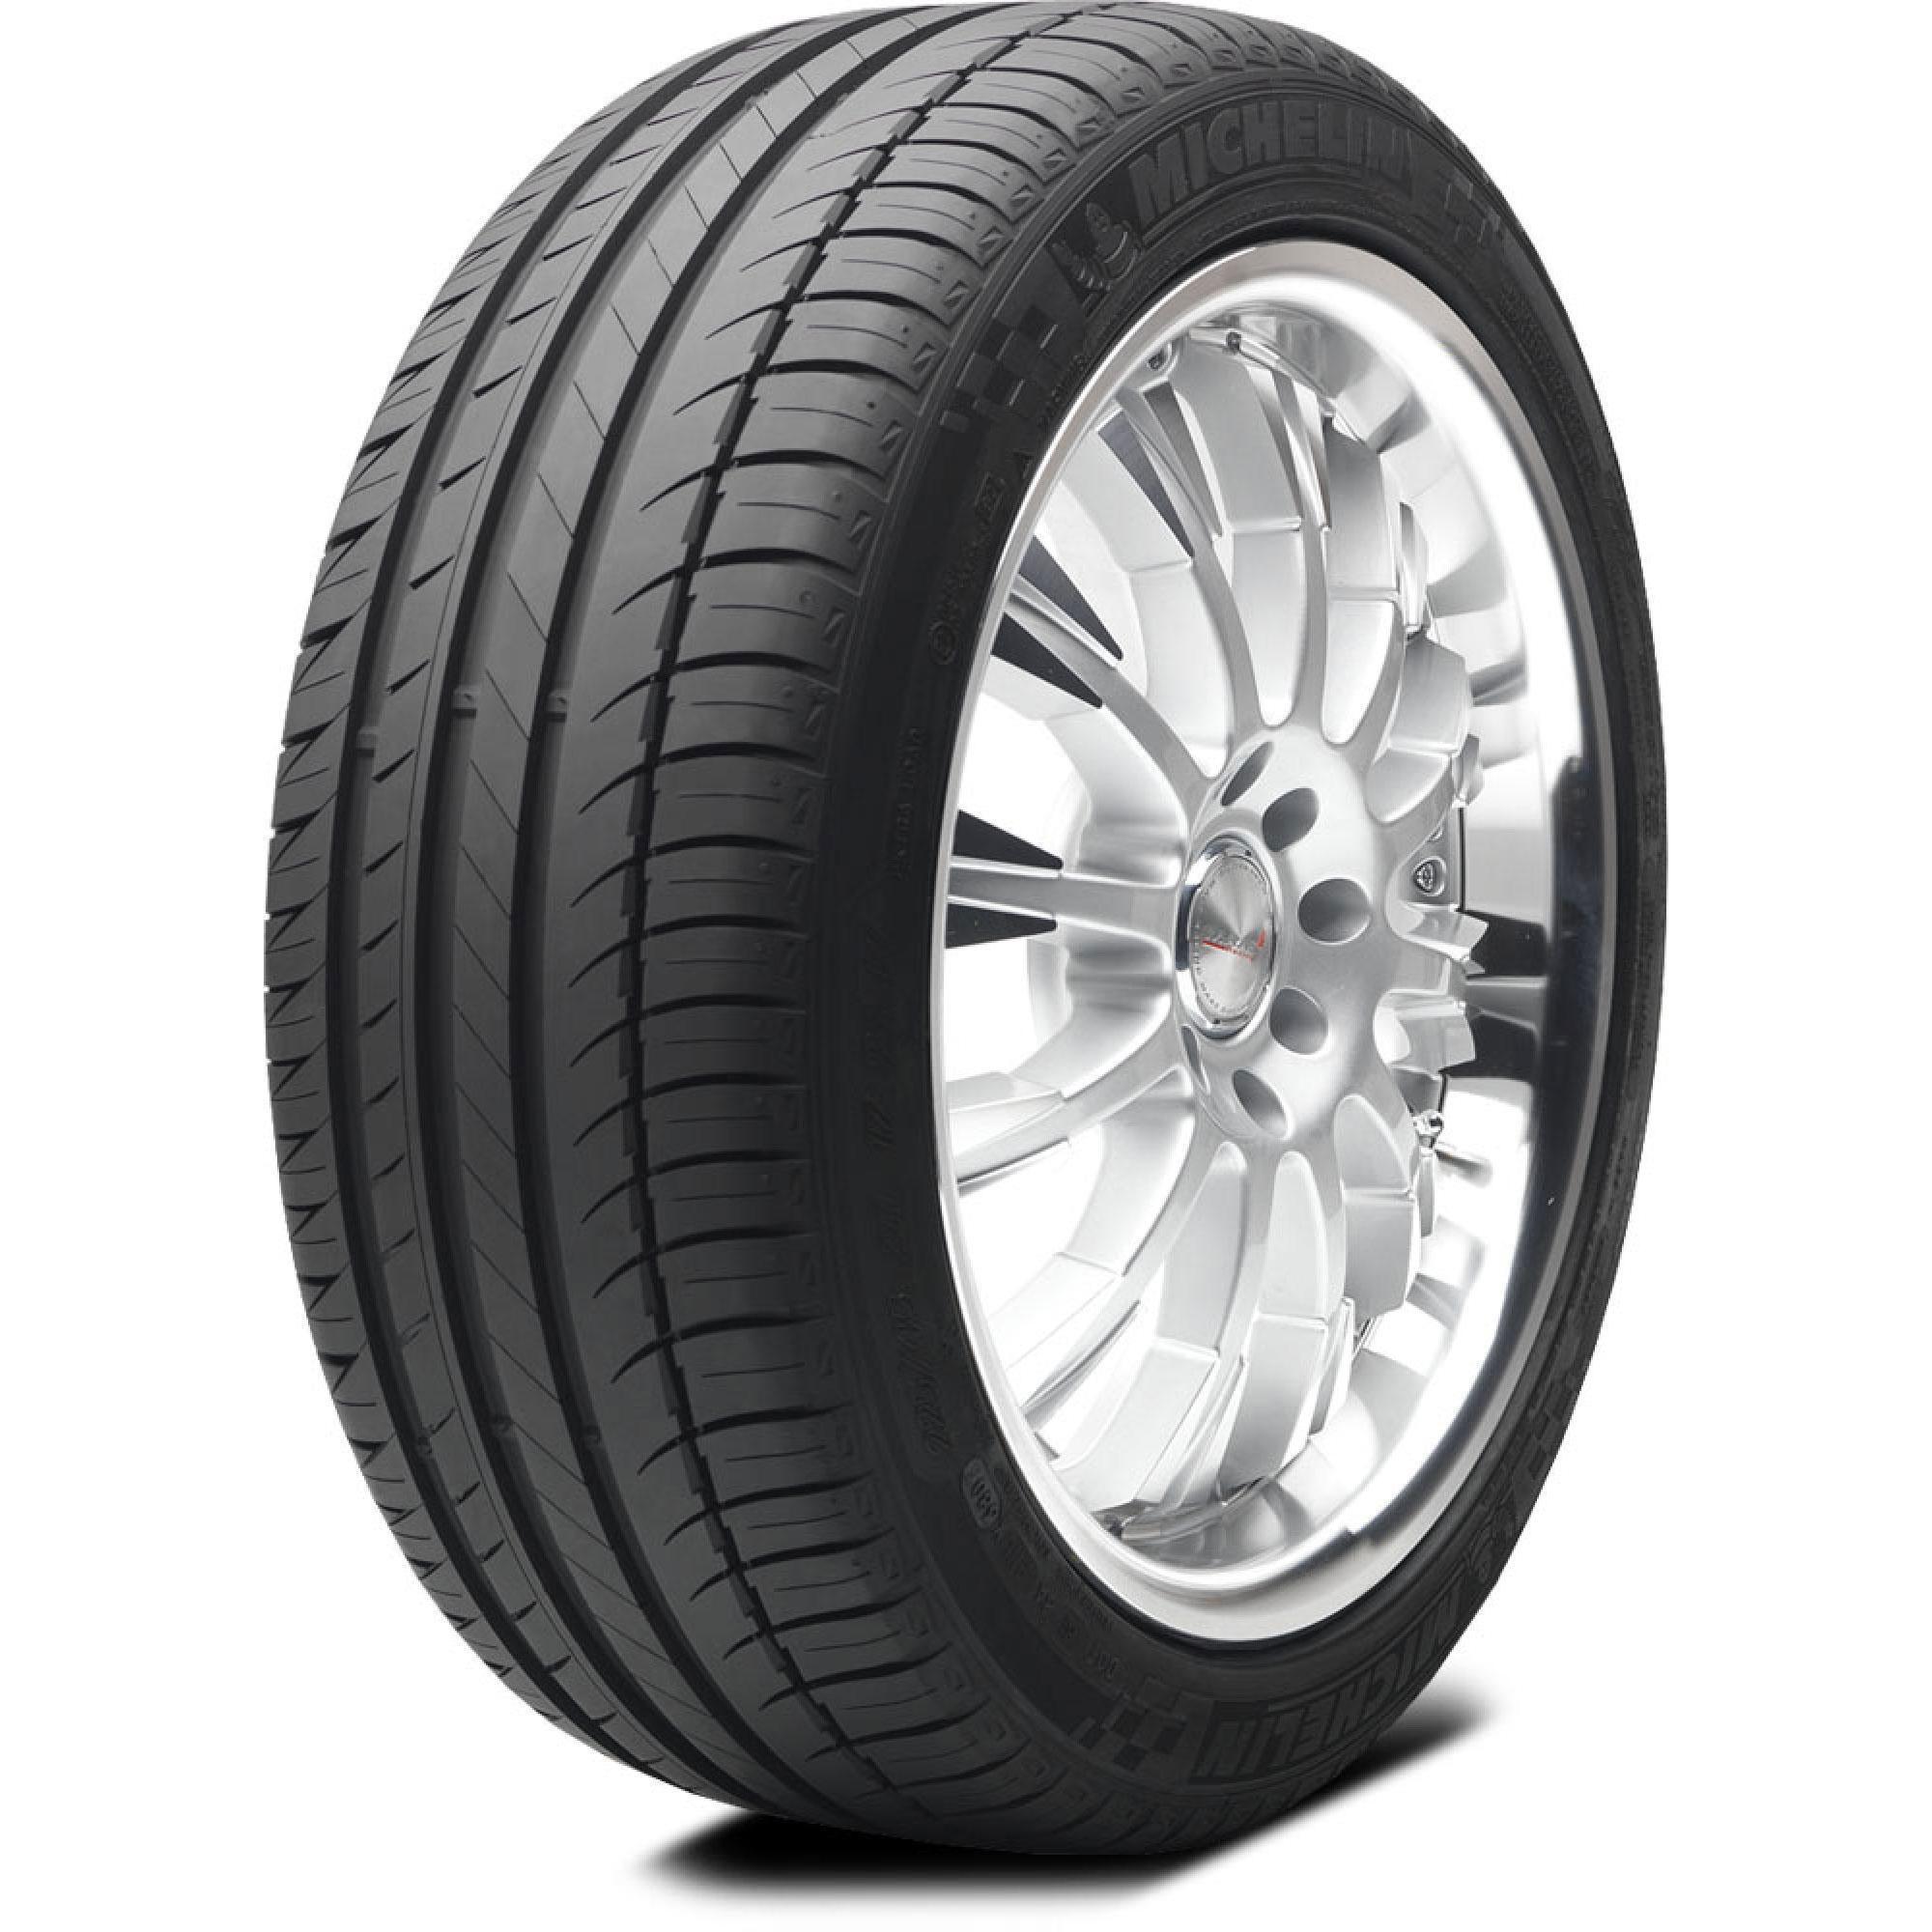 Michelin Pilot Exalto Pe2 Tirebuyer